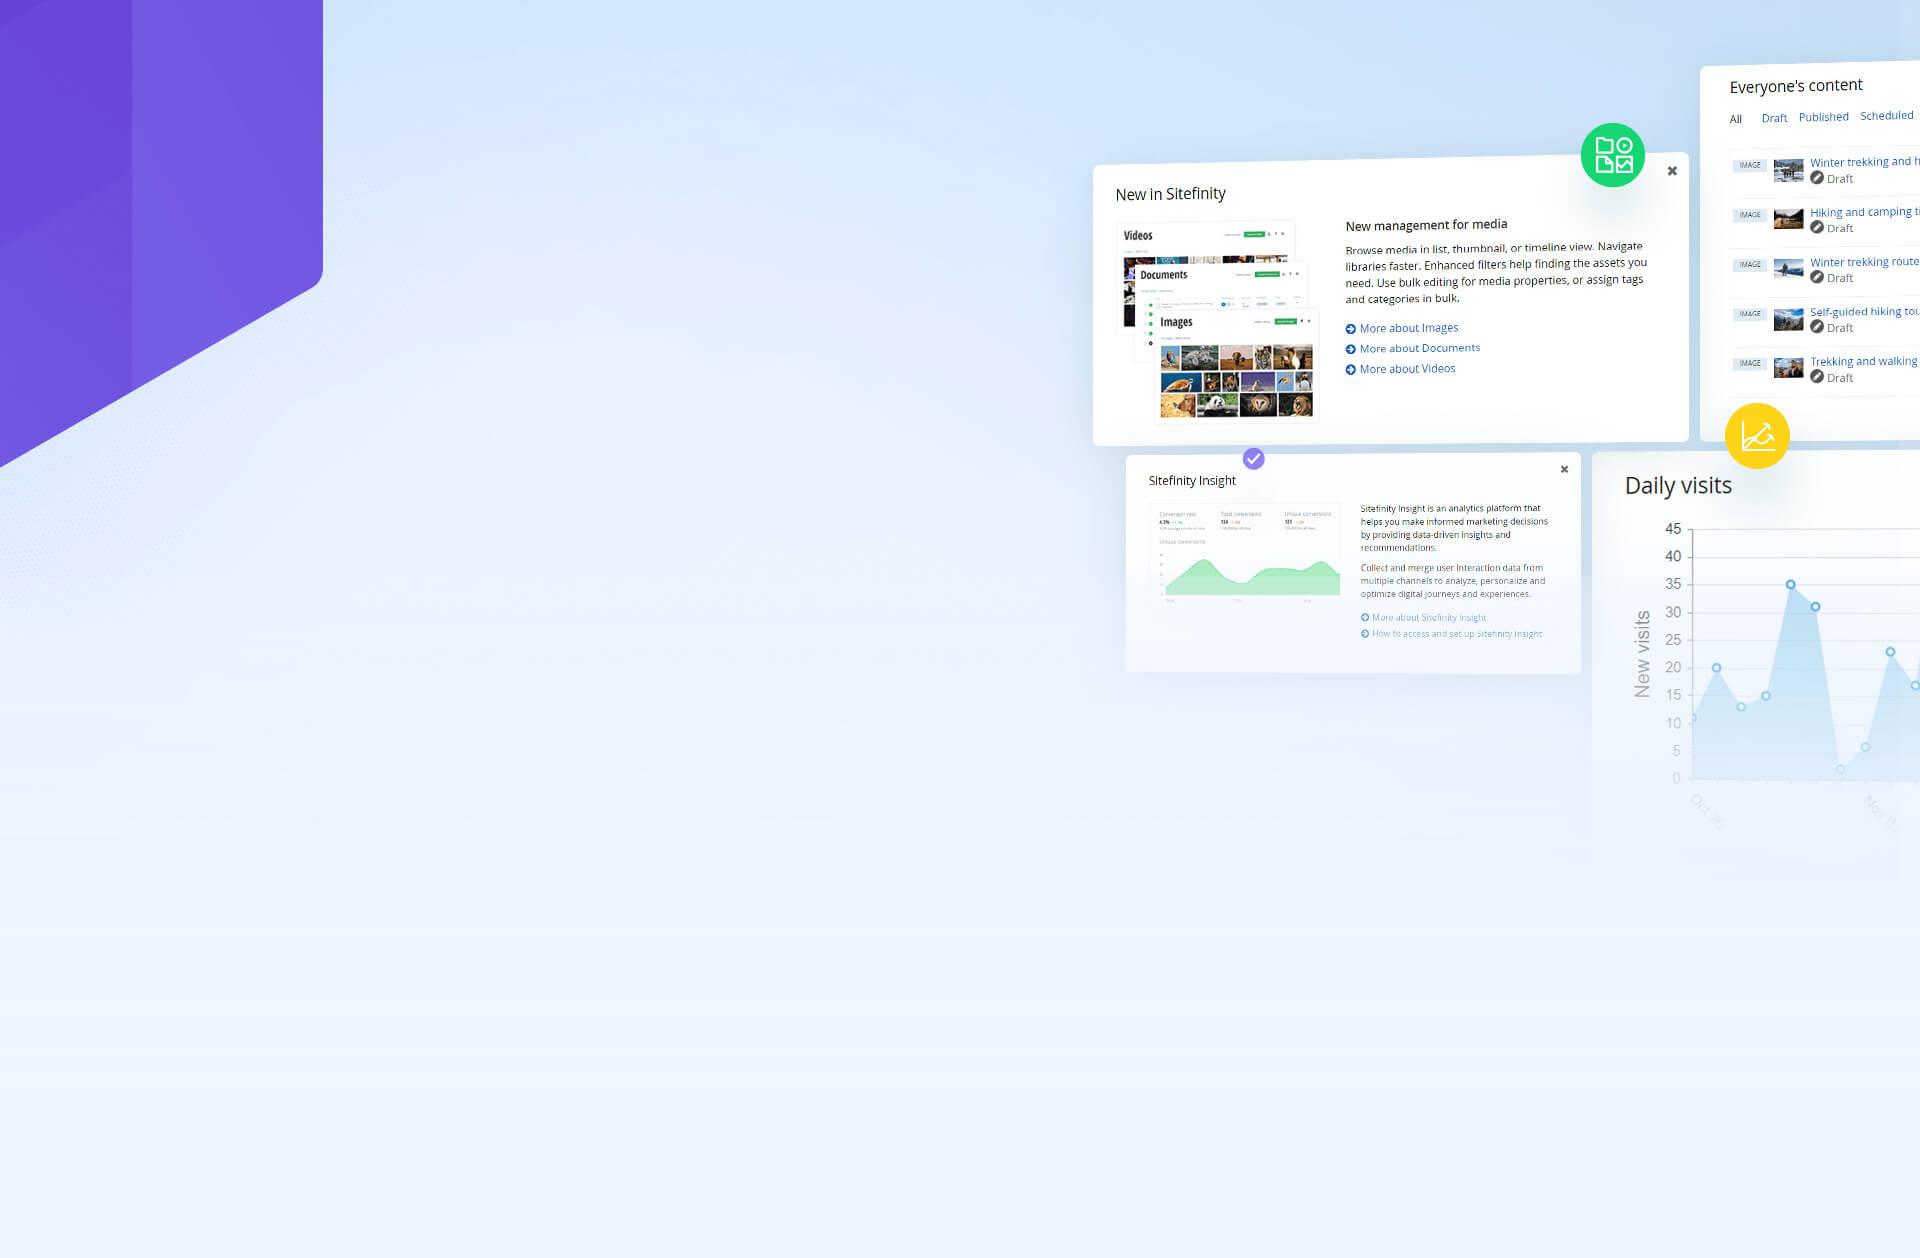 web-content-management-system-hero